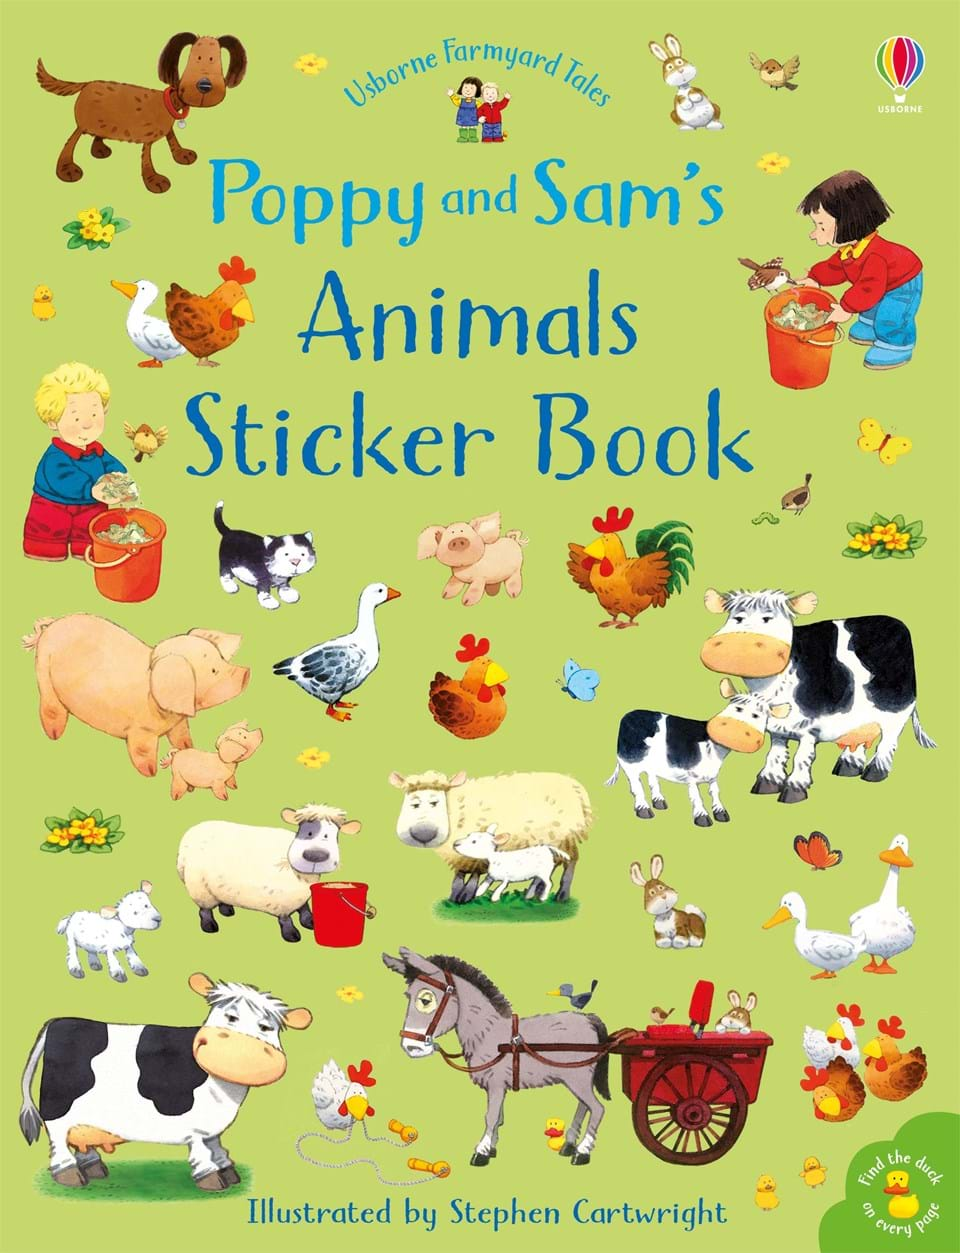 poppy-and-sam-animals-sticker-book